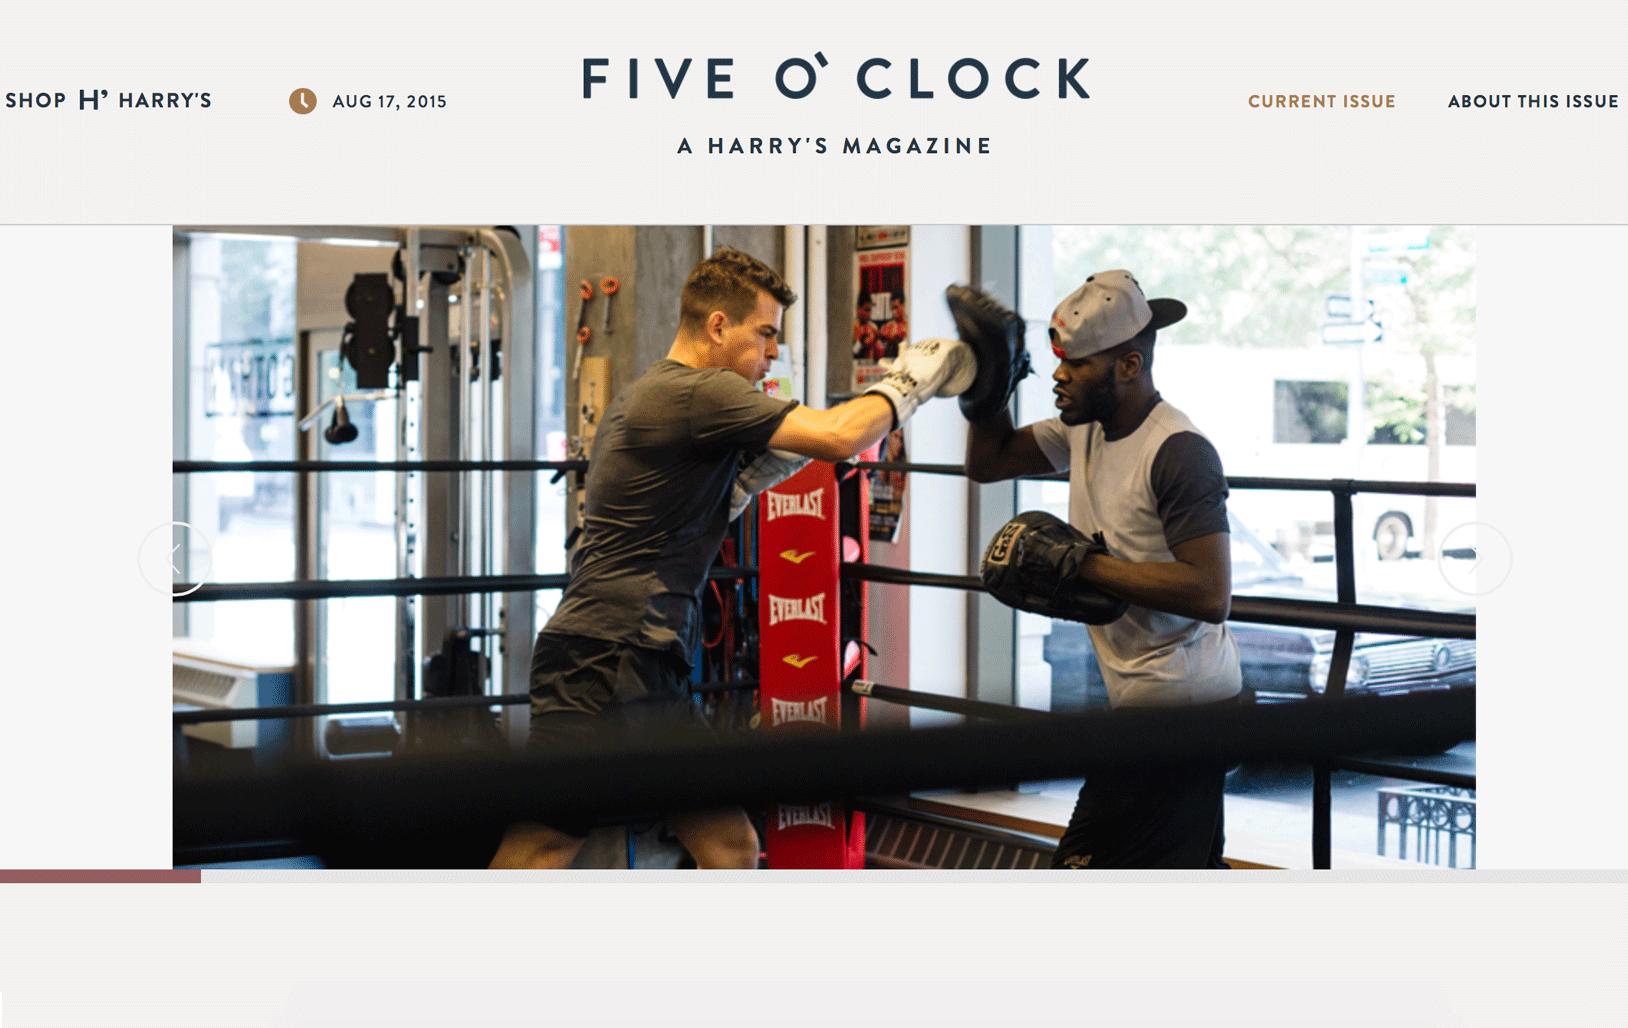 Five O' Clock  by Harry's